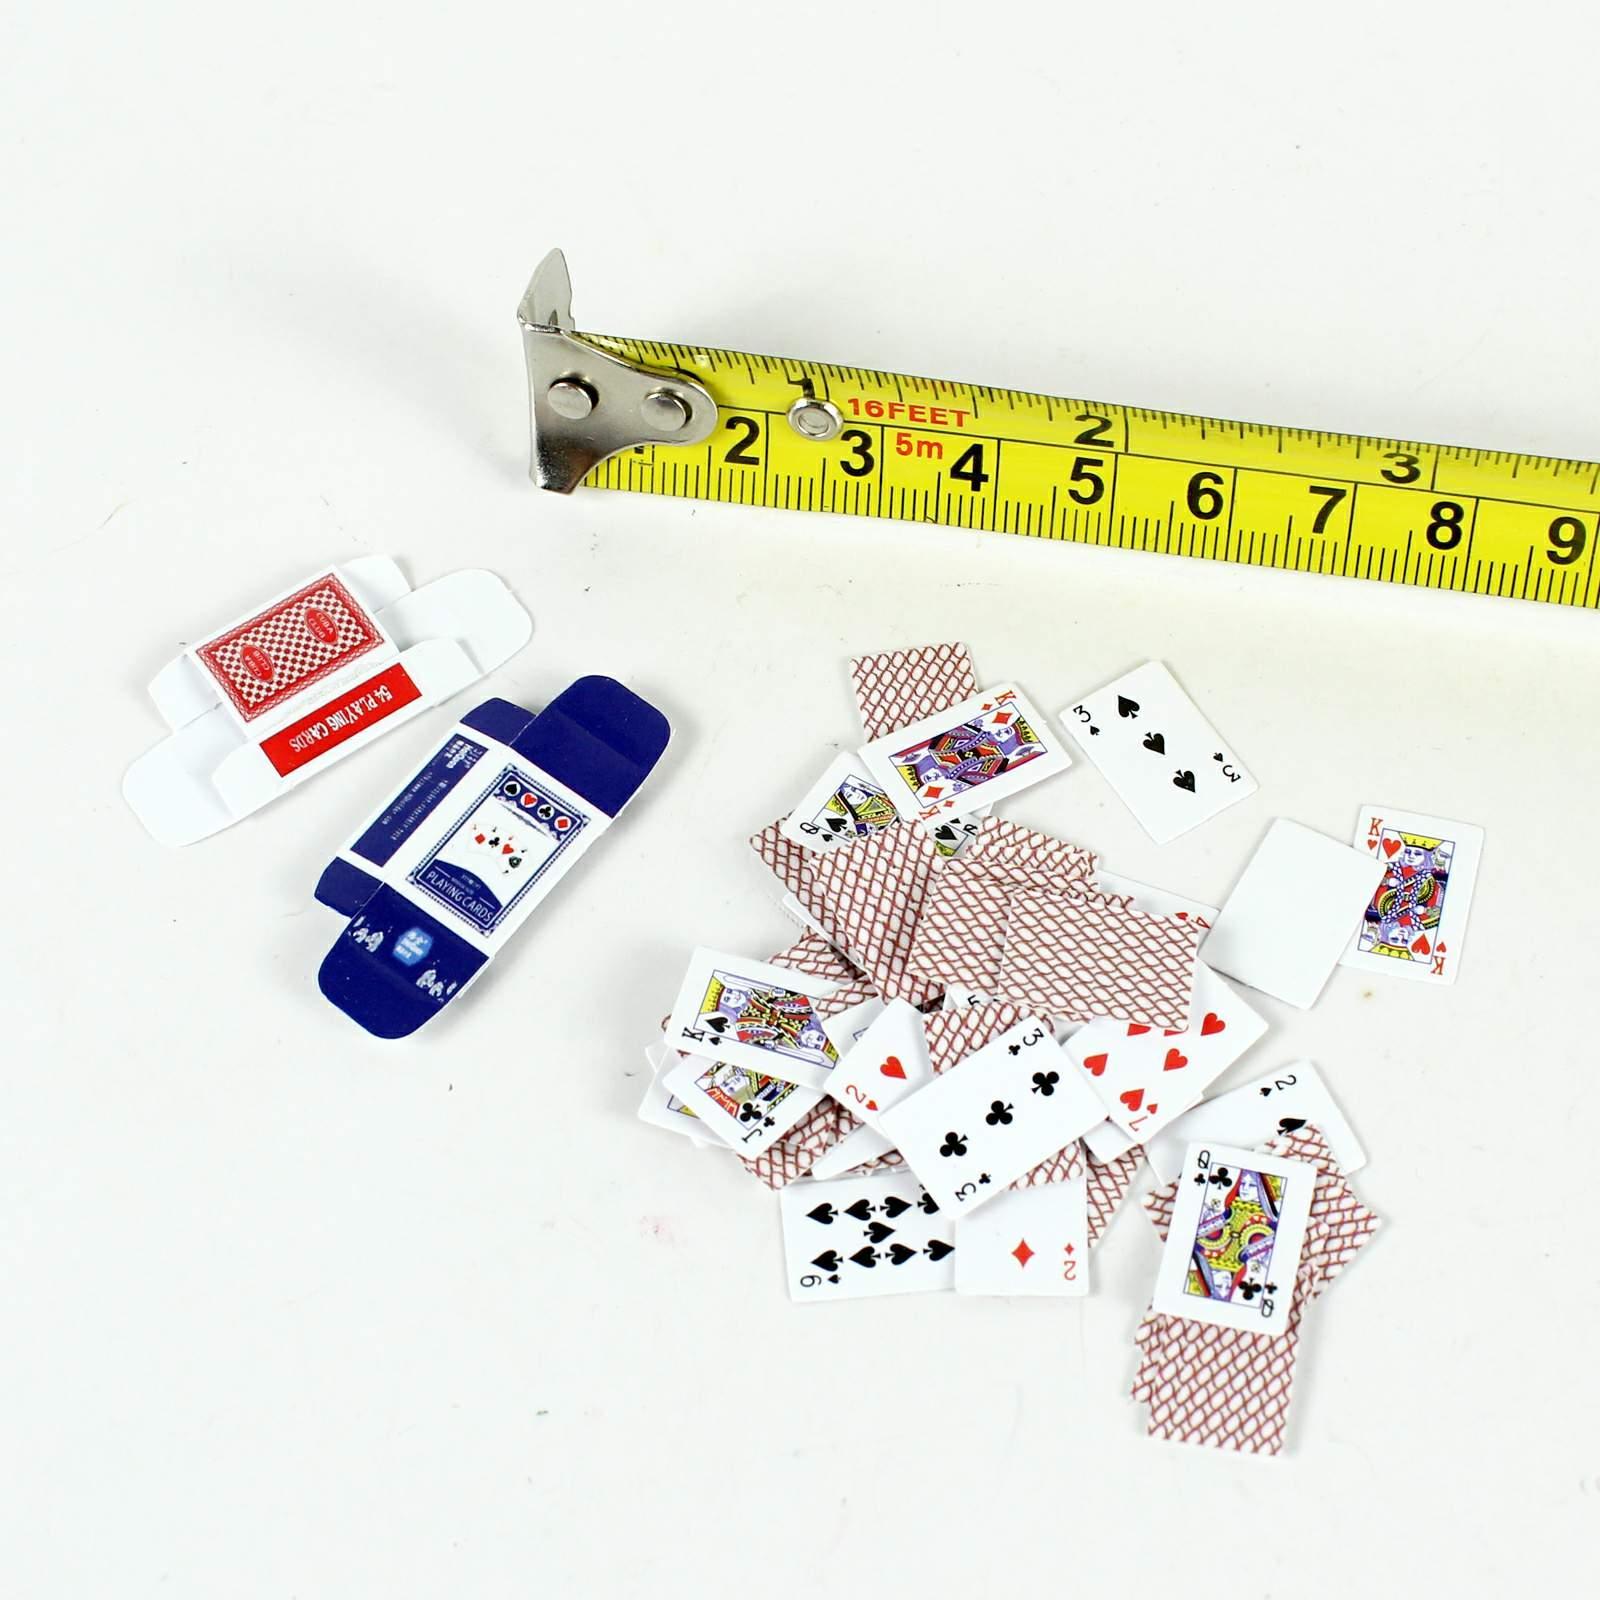 Mnotht 1/6 modelo de póker soldado a escala para 12 pulgadas accesorios de figuras de acción escena de juguete